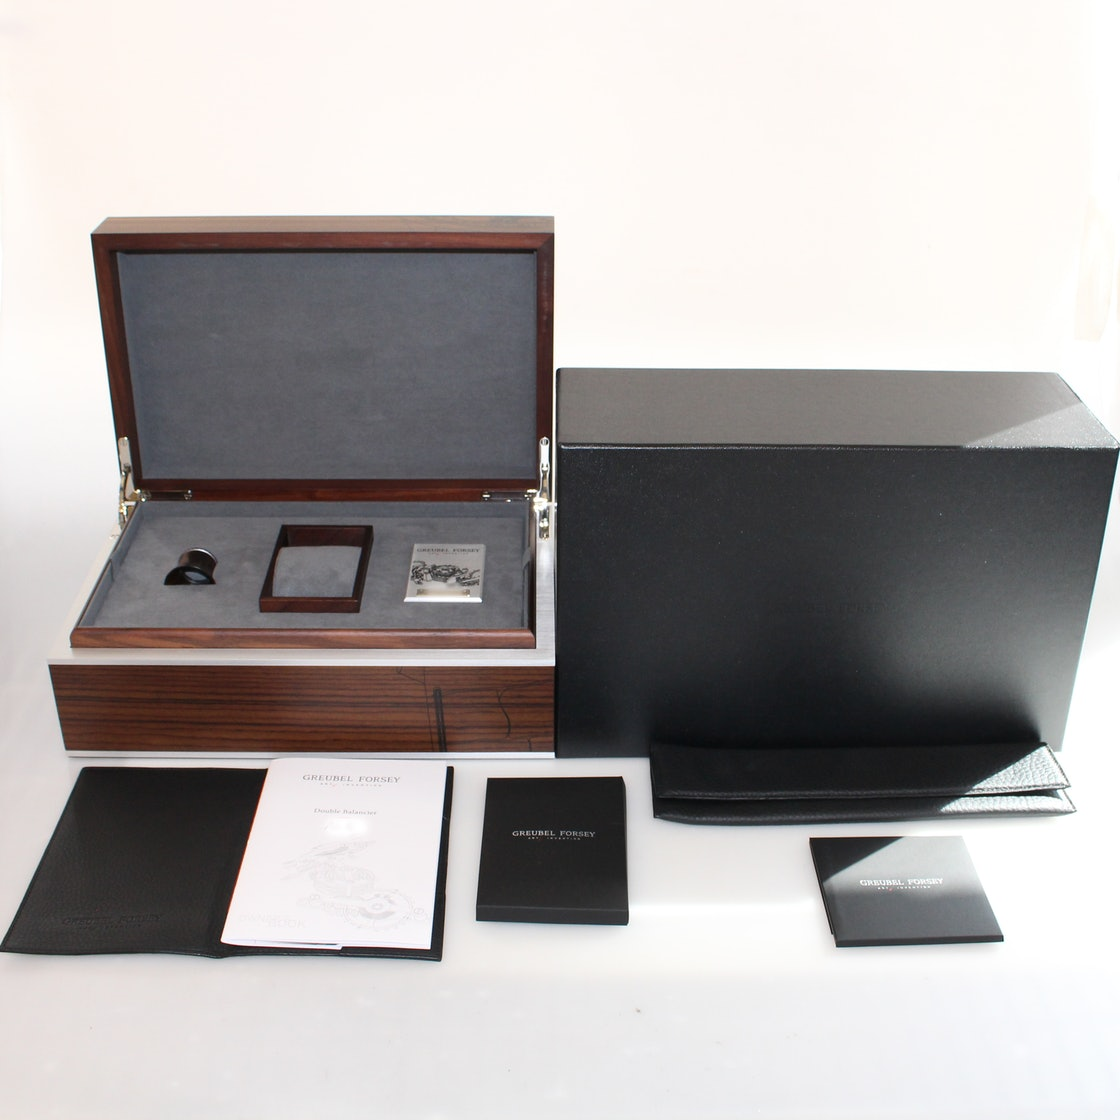 Greubel Forsey Double Balancier Limited Edition P00193